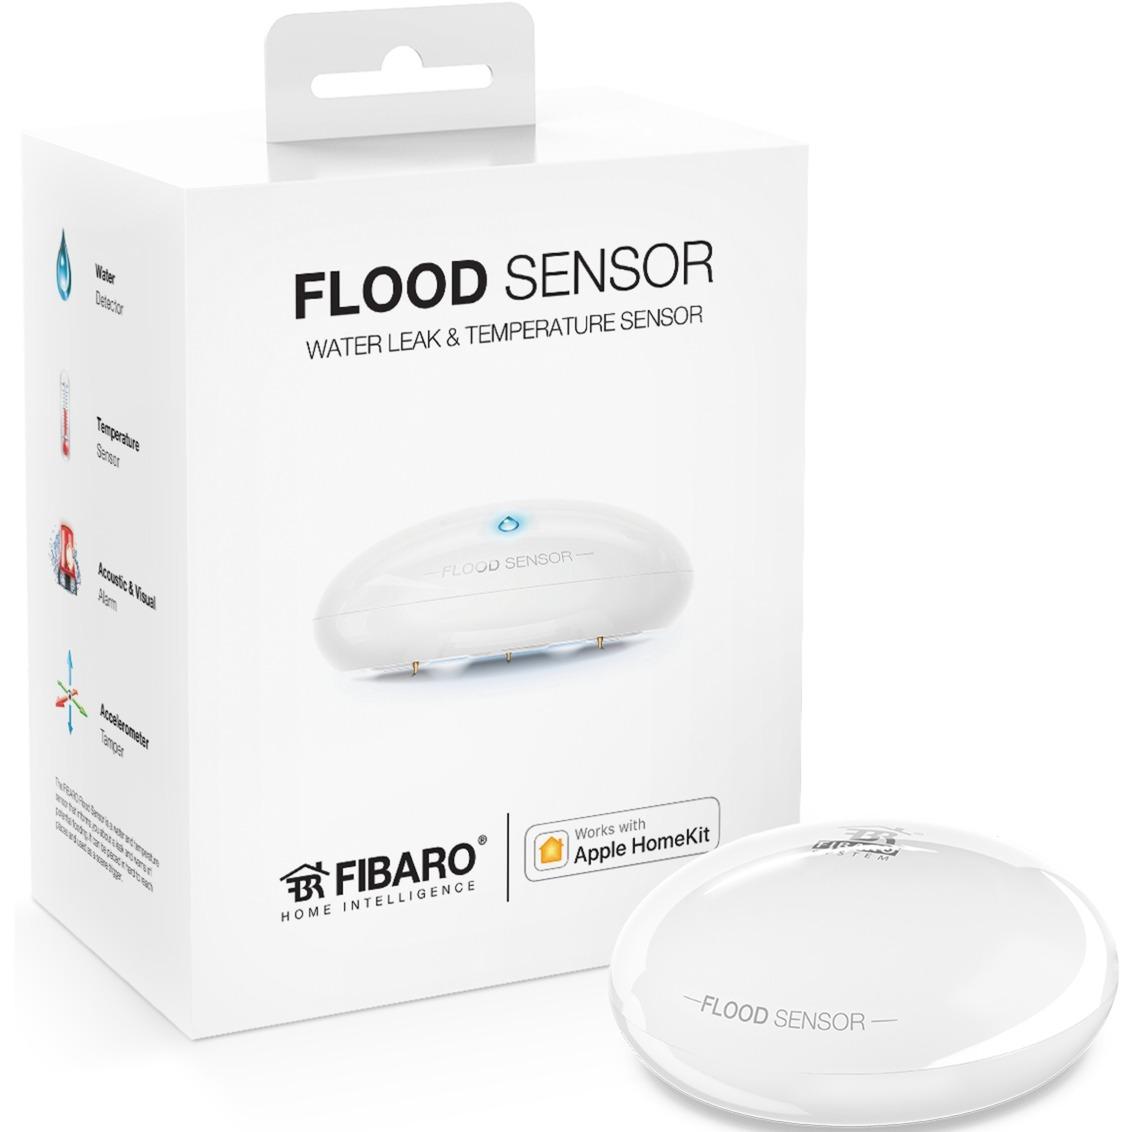 FGBHFS-101 Inalámbrico Bluetooth mulltisensor smart home